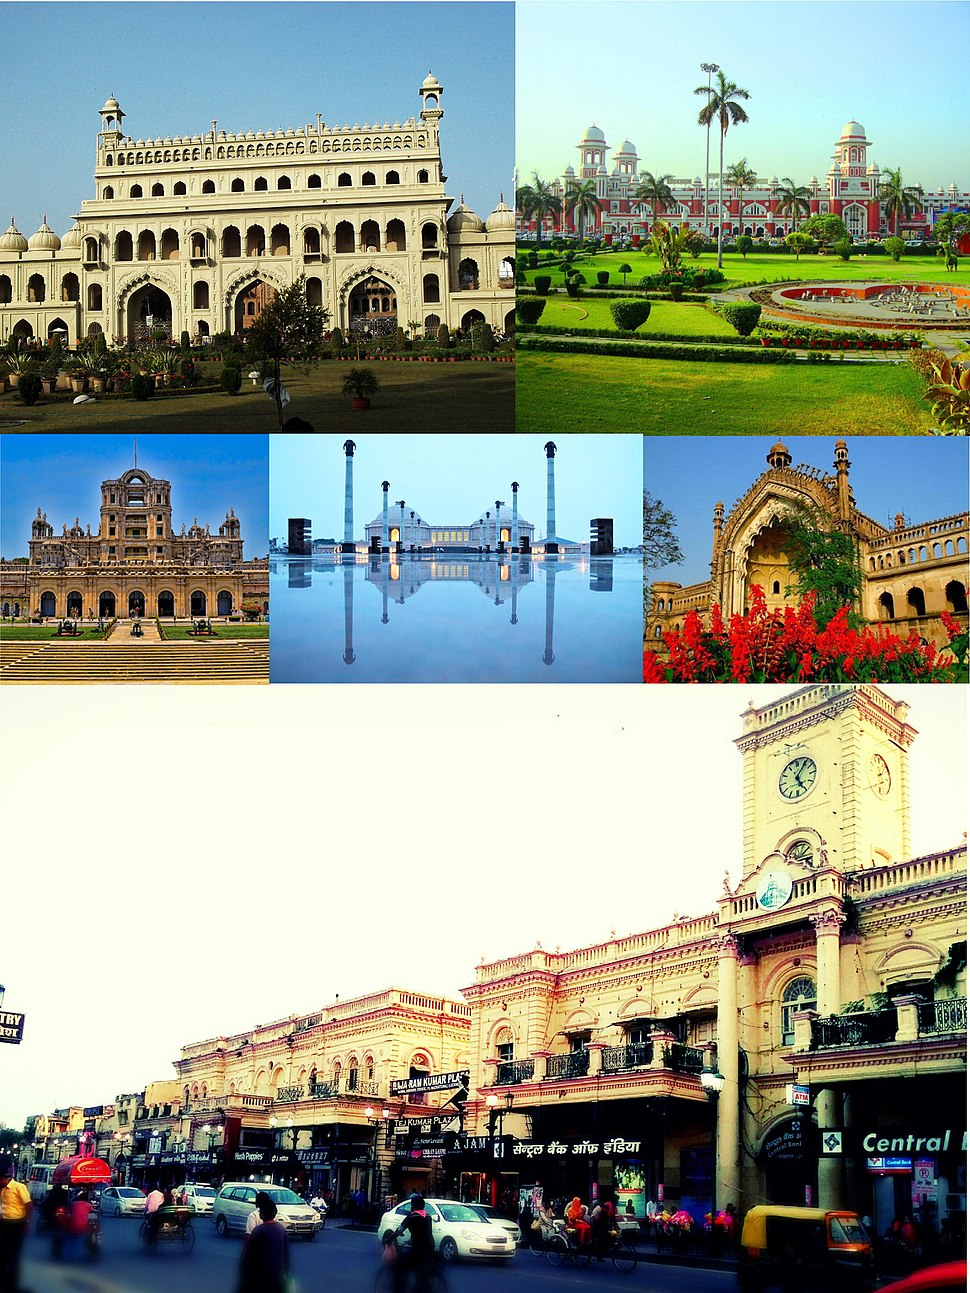 Clockwise from top: Bada Imambara, Charbagh Railway Station, Rumi Darwaza, Hazratganj, La Martiniere School, Ambedkar Memorial Park